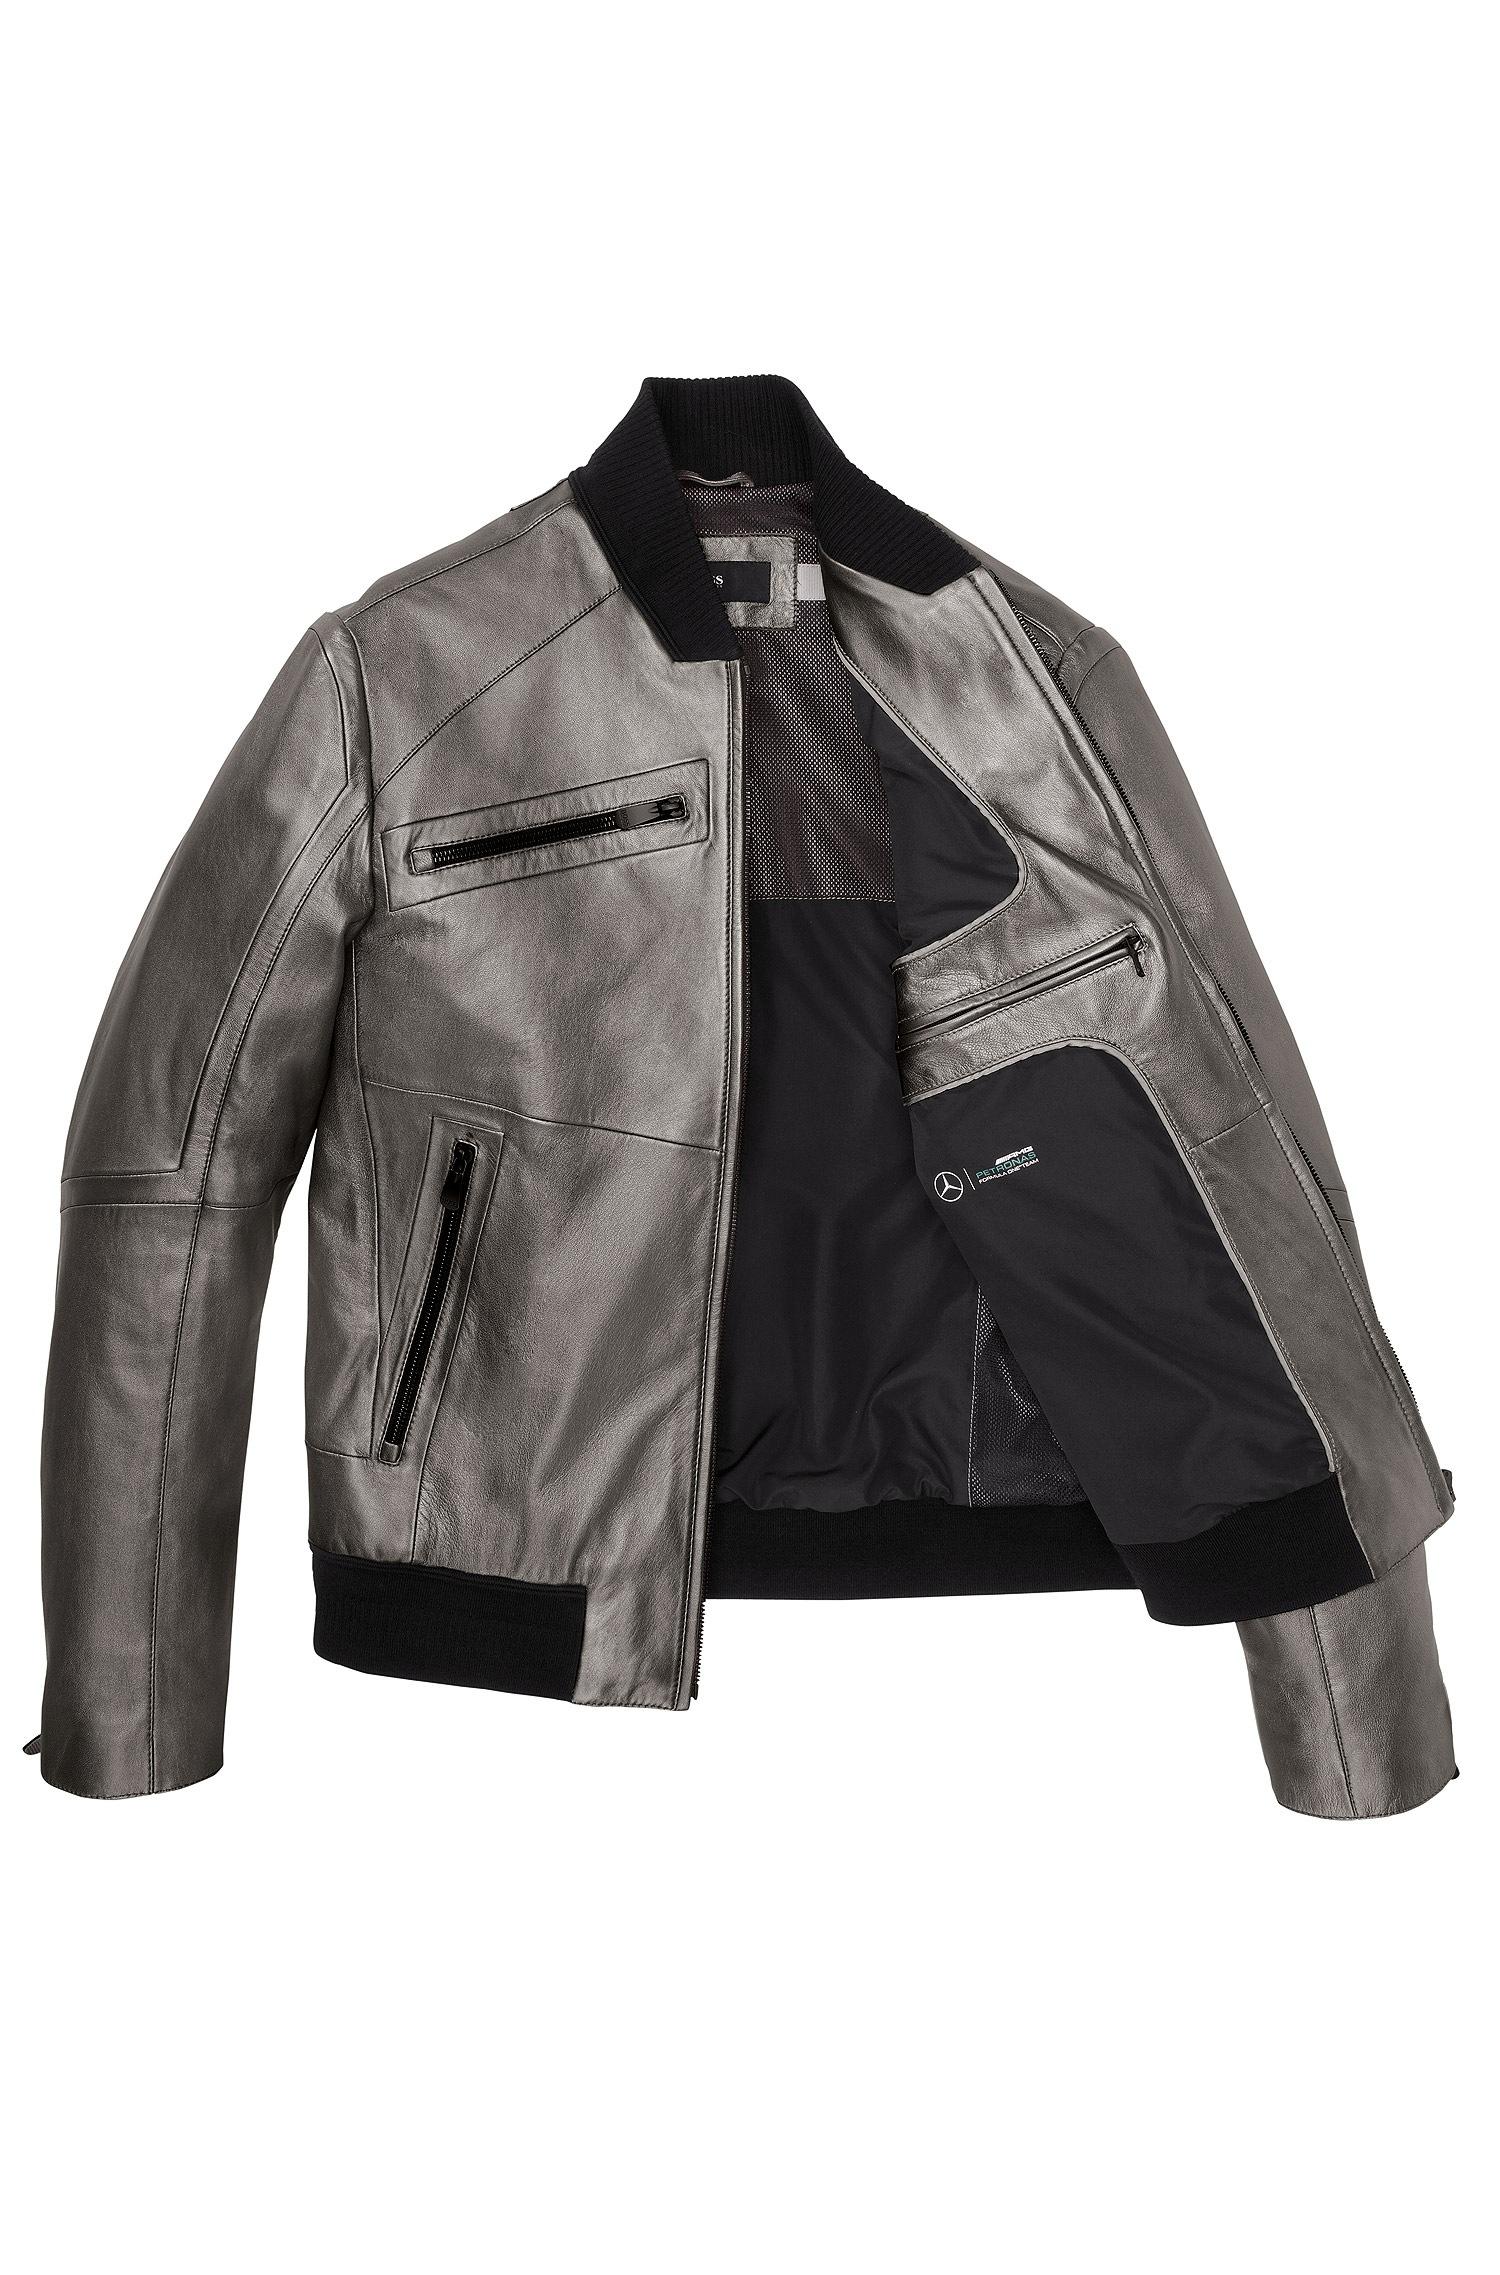 Boss marquel woolblend blazer in blue for men lyst for Mercedes benz leather jacket